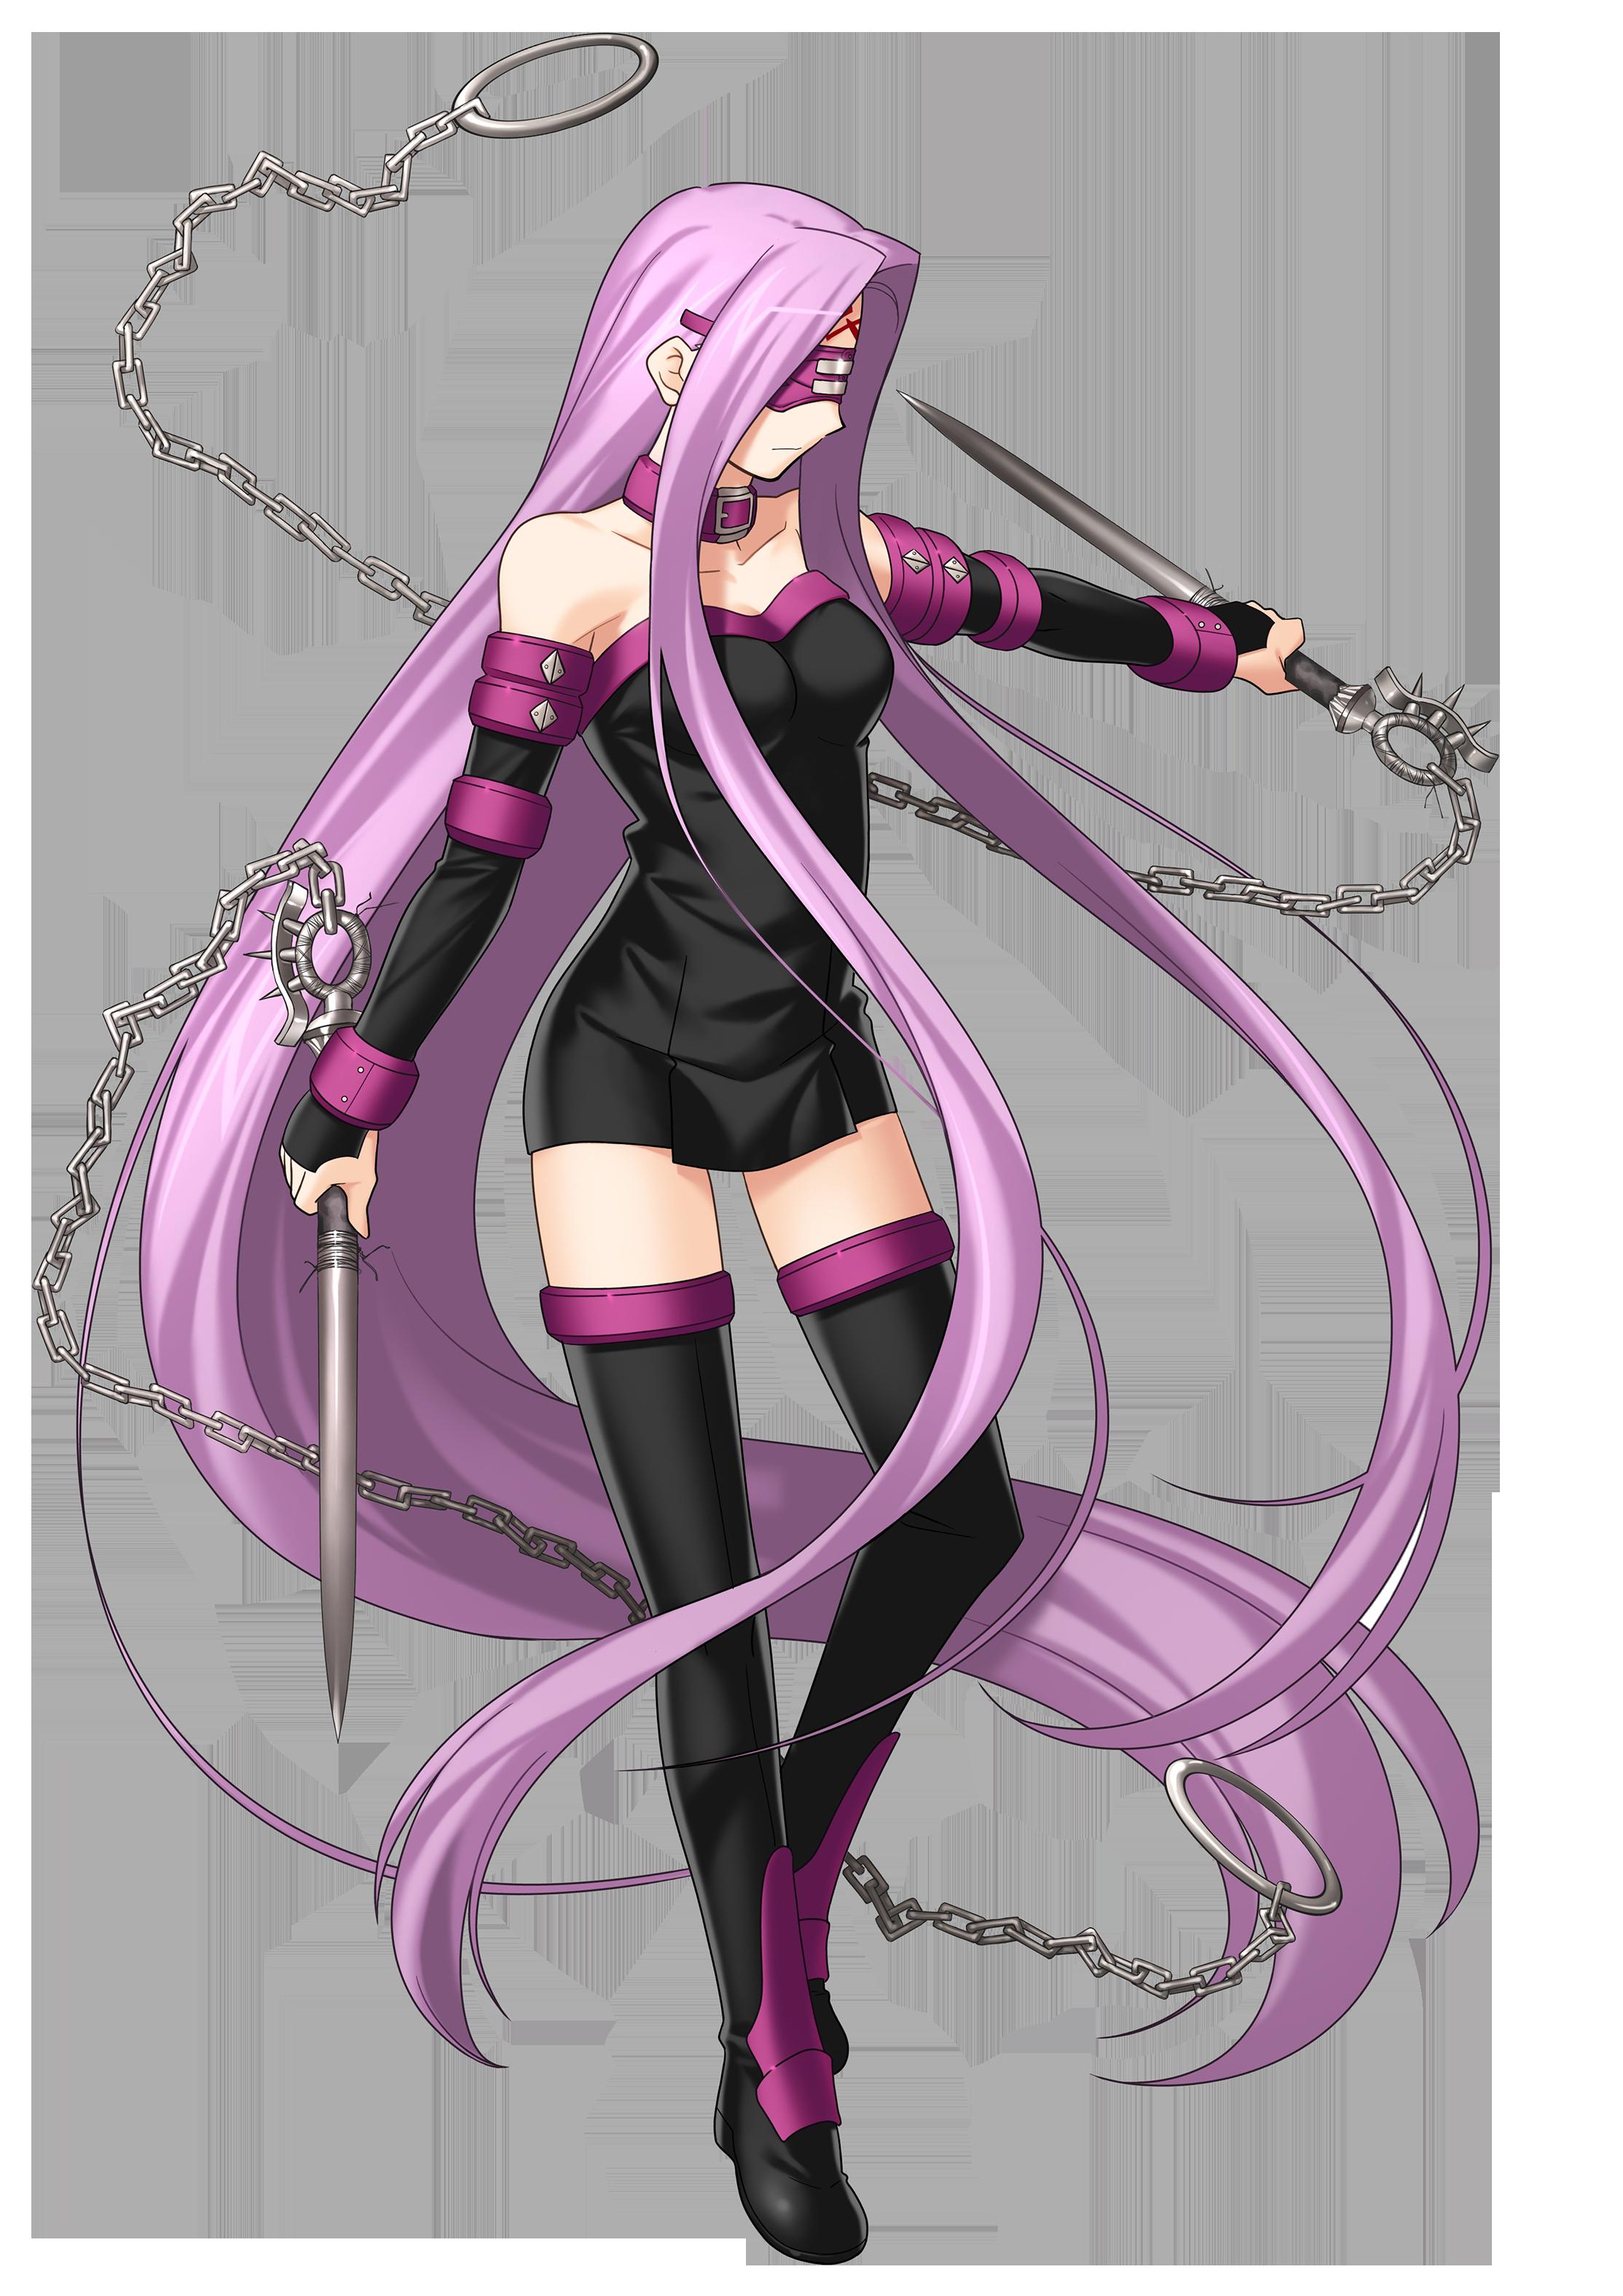 Rider Fate Stay Night Vs Battles Wiki Fandom